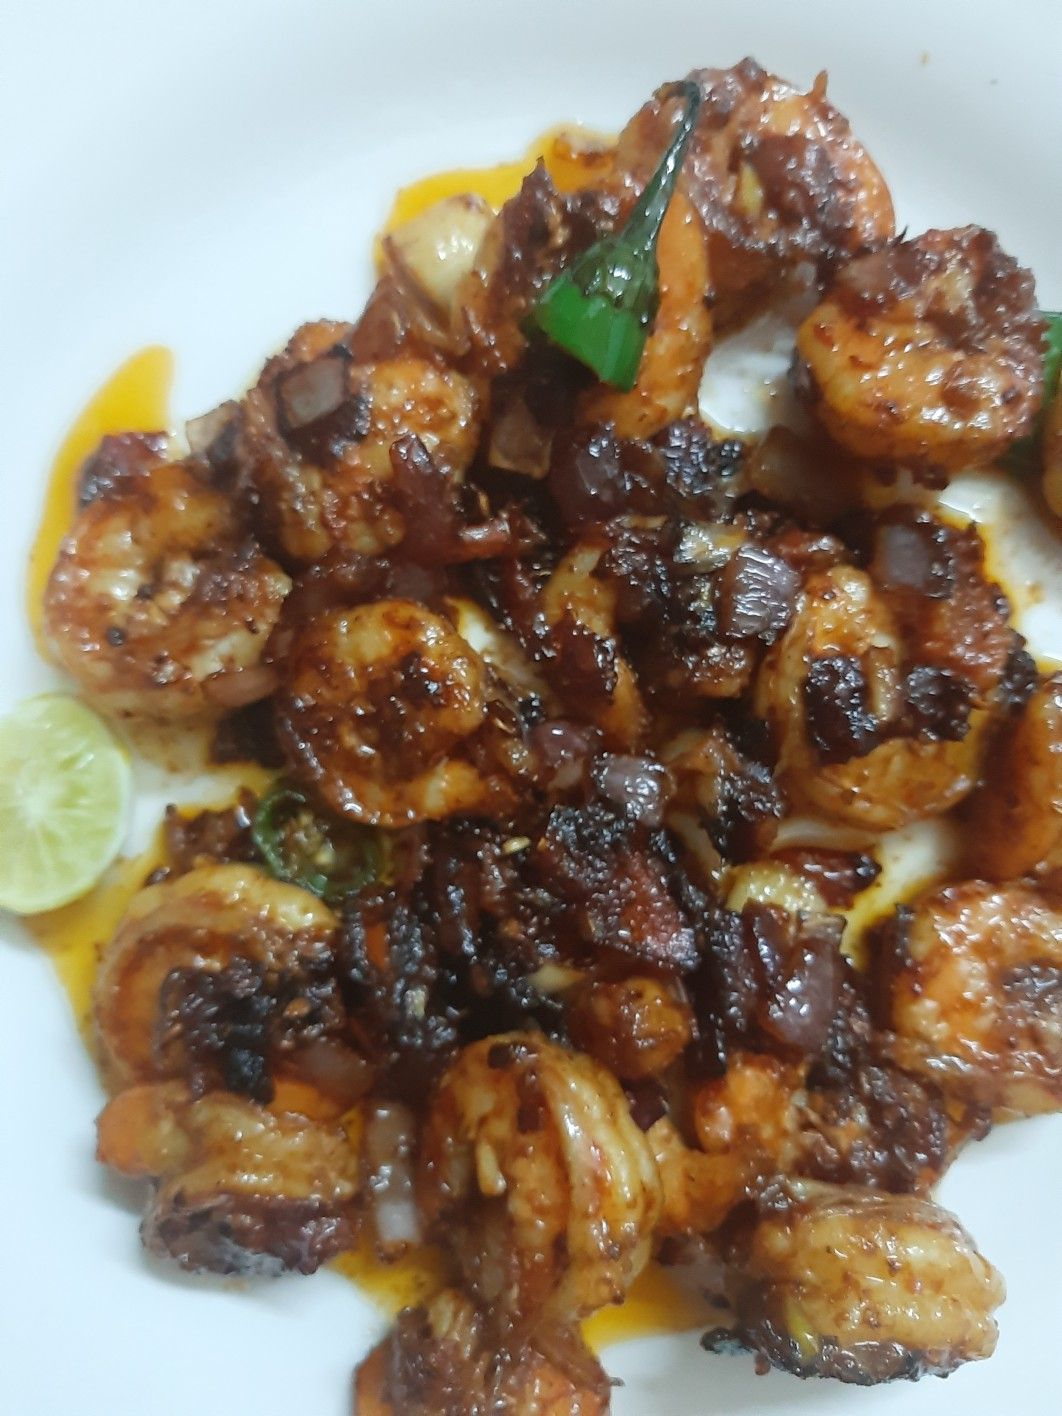 روبيان مقلقل في ٦٠ ثانية بصوص لذيذ اوي Cooking Recipes Cooking Recipes